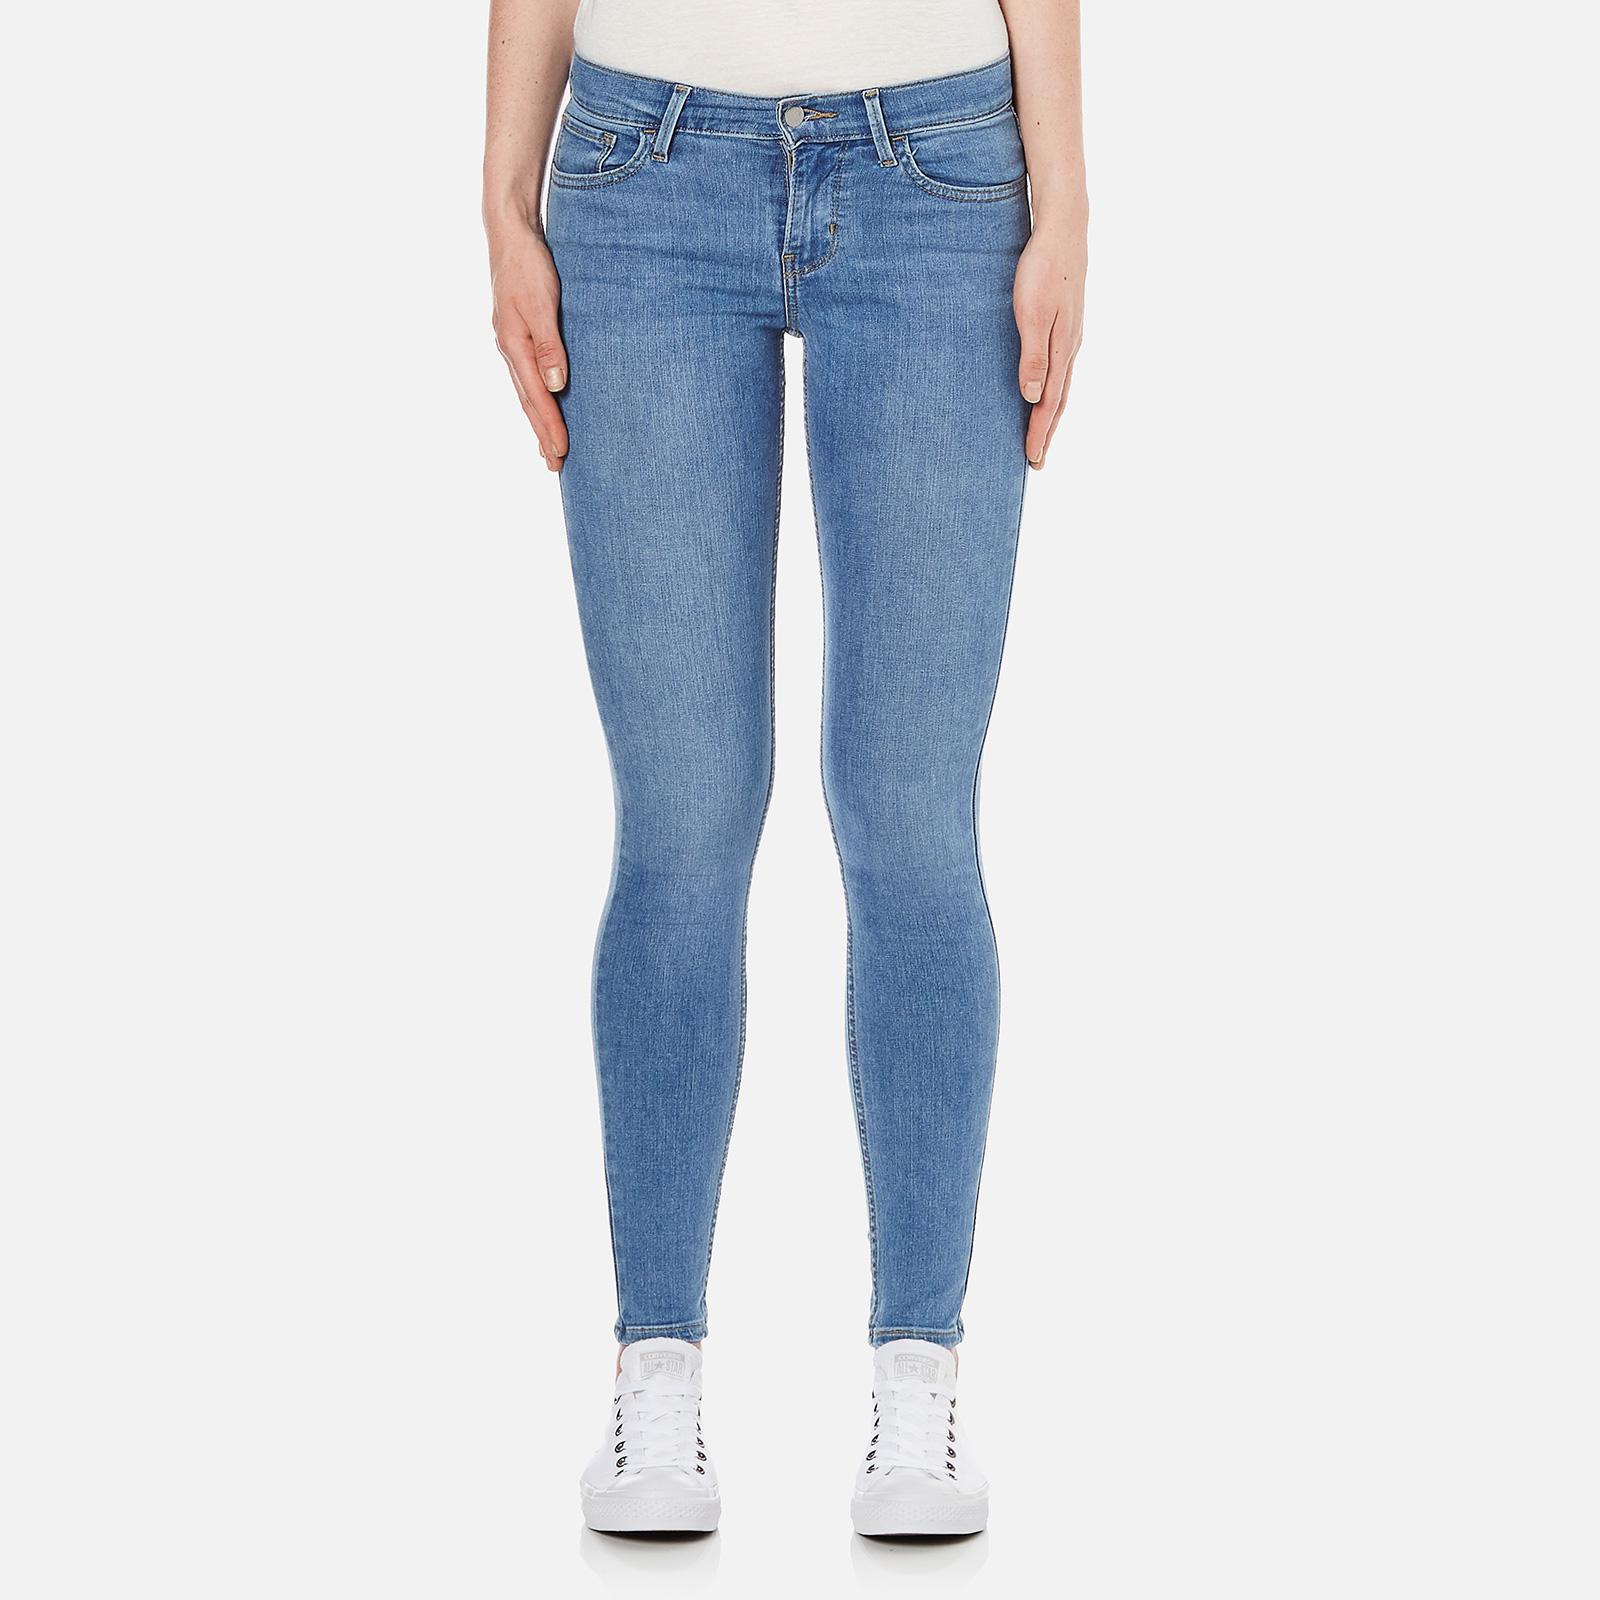 a6f6b3d5 Levi's Women's 710 FlawlessFX Super Skinny Jeans - Spirit Song Clothing |  TheHut.com